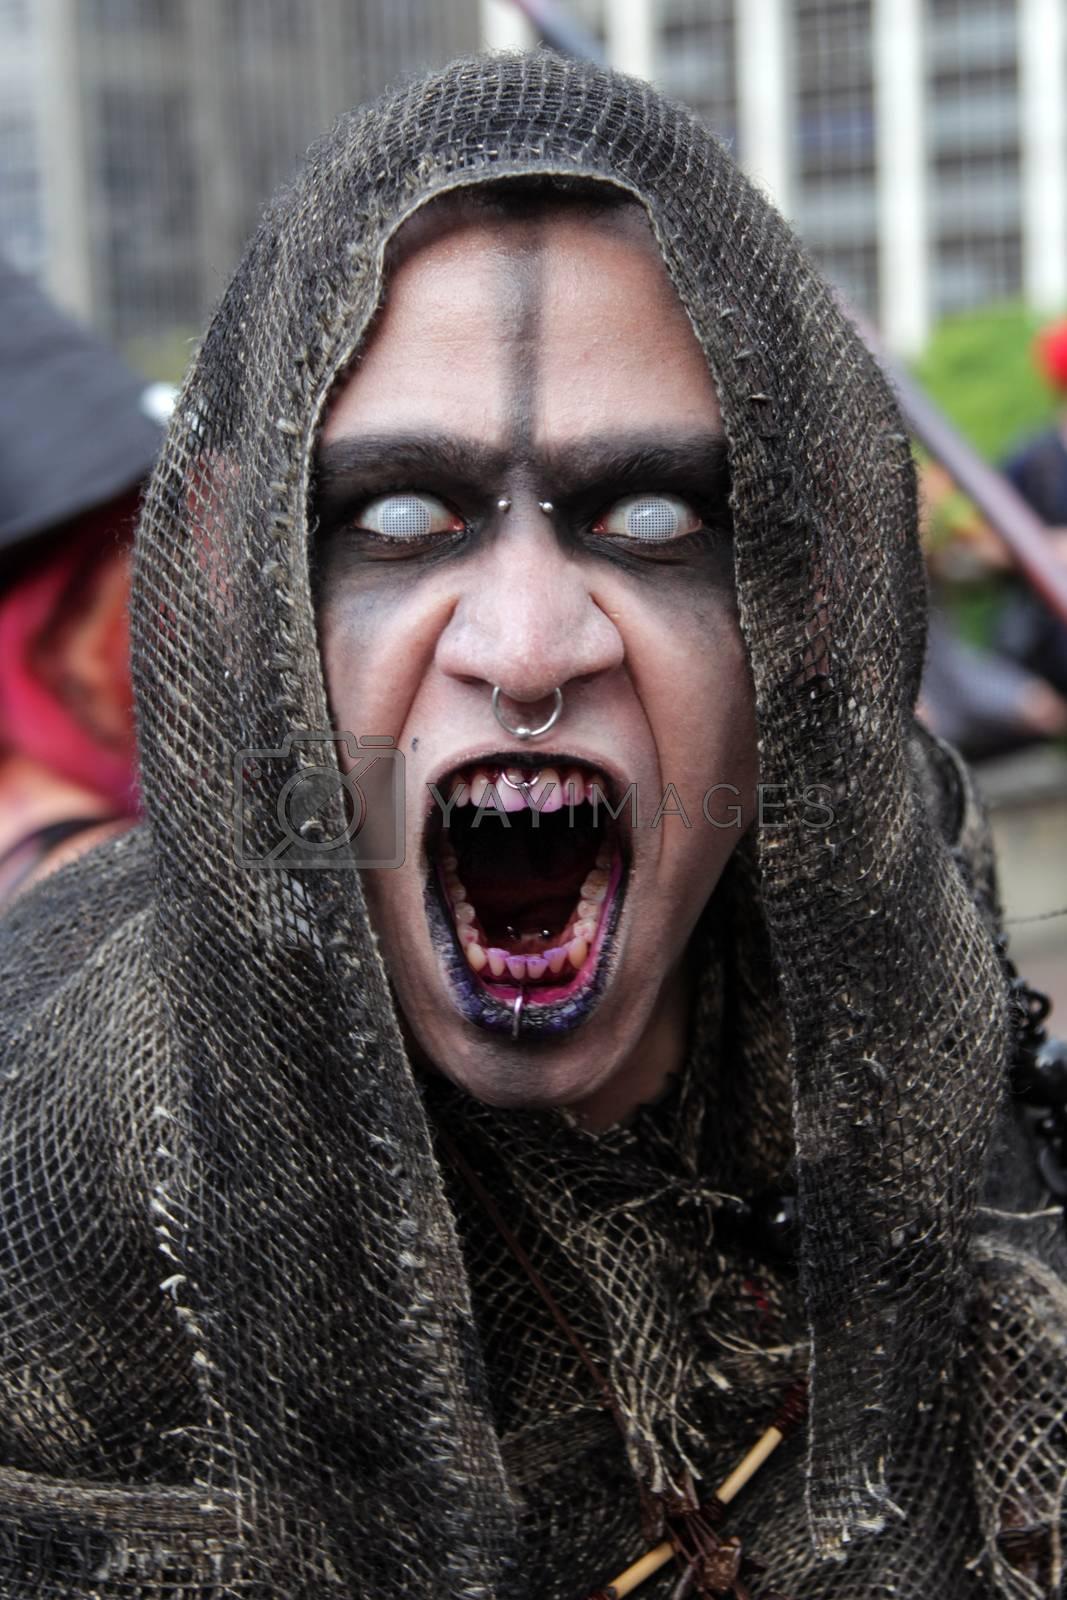 Sao Paulo, Brazil November 11 2015: An unidentified man in scare costumes in the annual event Zombie Walk in Sao Paulo Brazil.